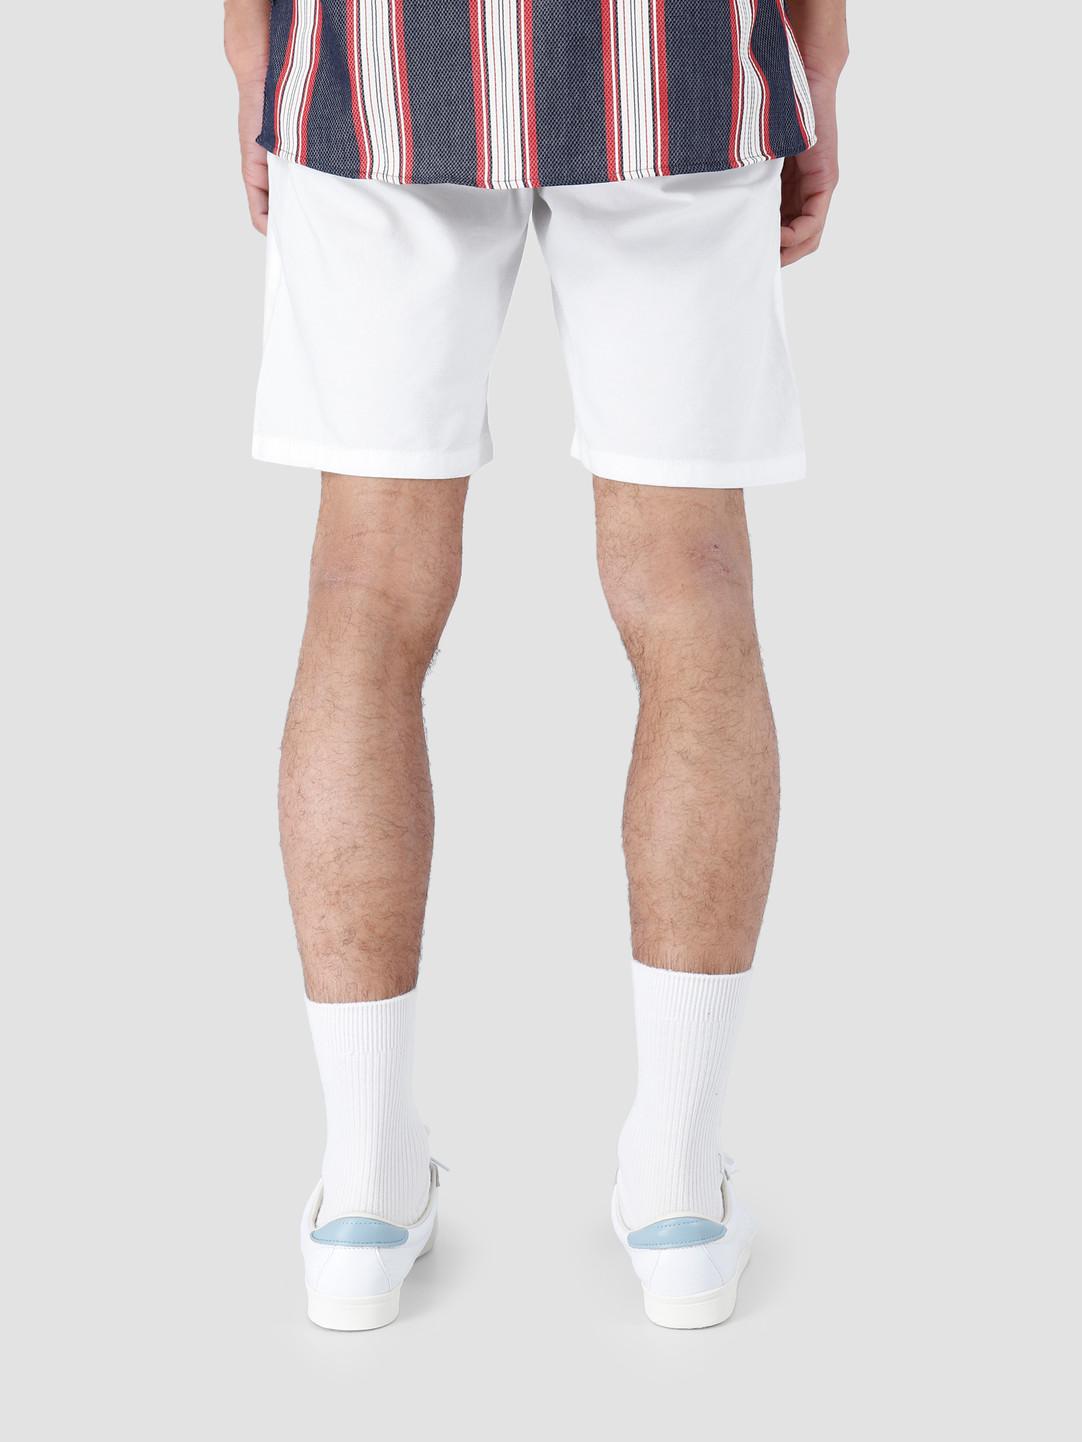 Kronstadt Kronstadt Jonas Oxford Dyed Short Off White KS2686